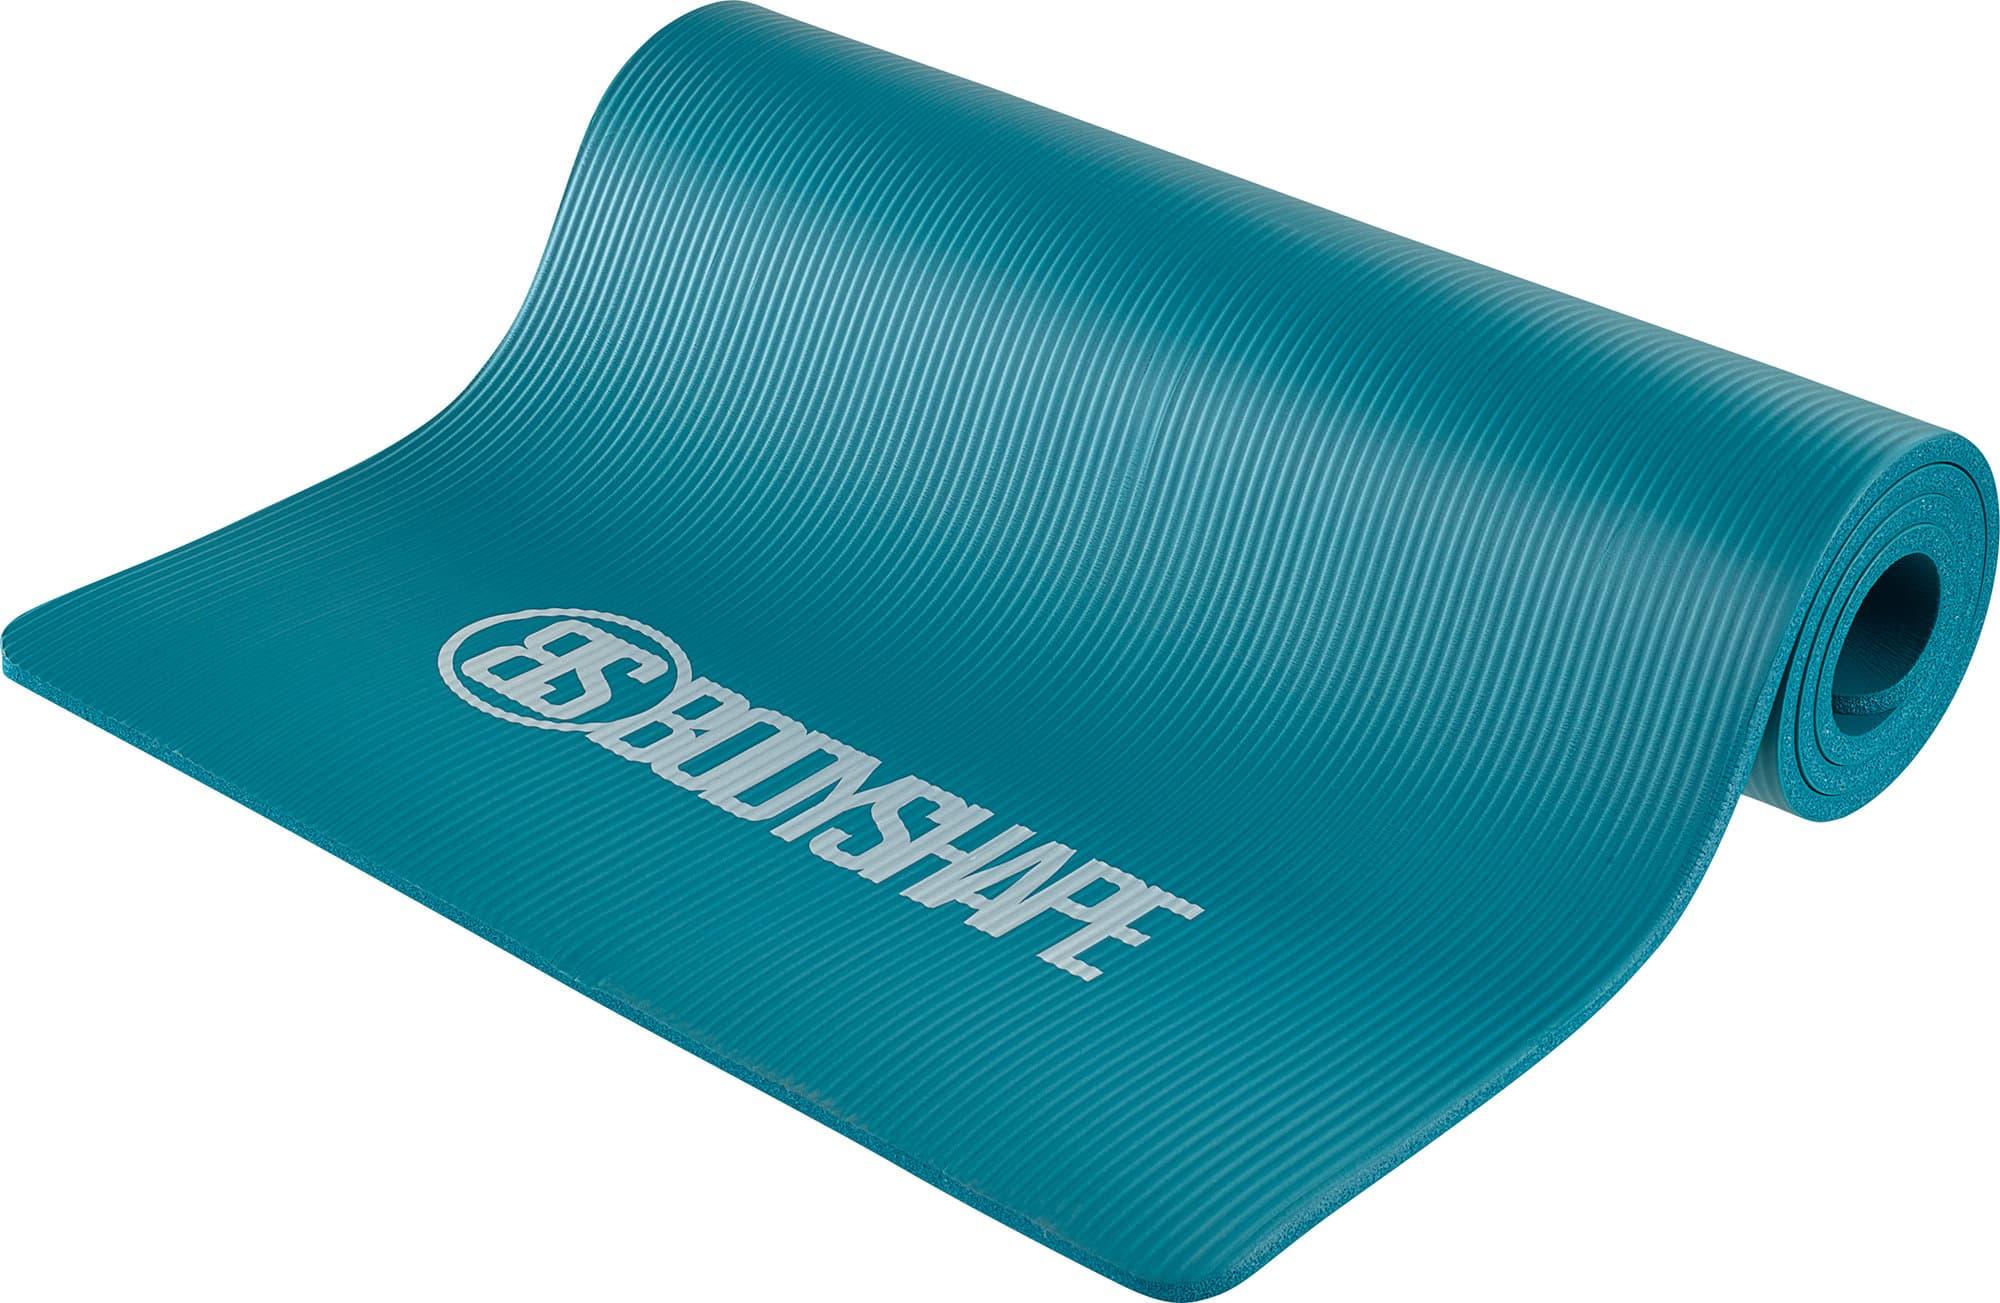 Bodyshape Materassino fitness